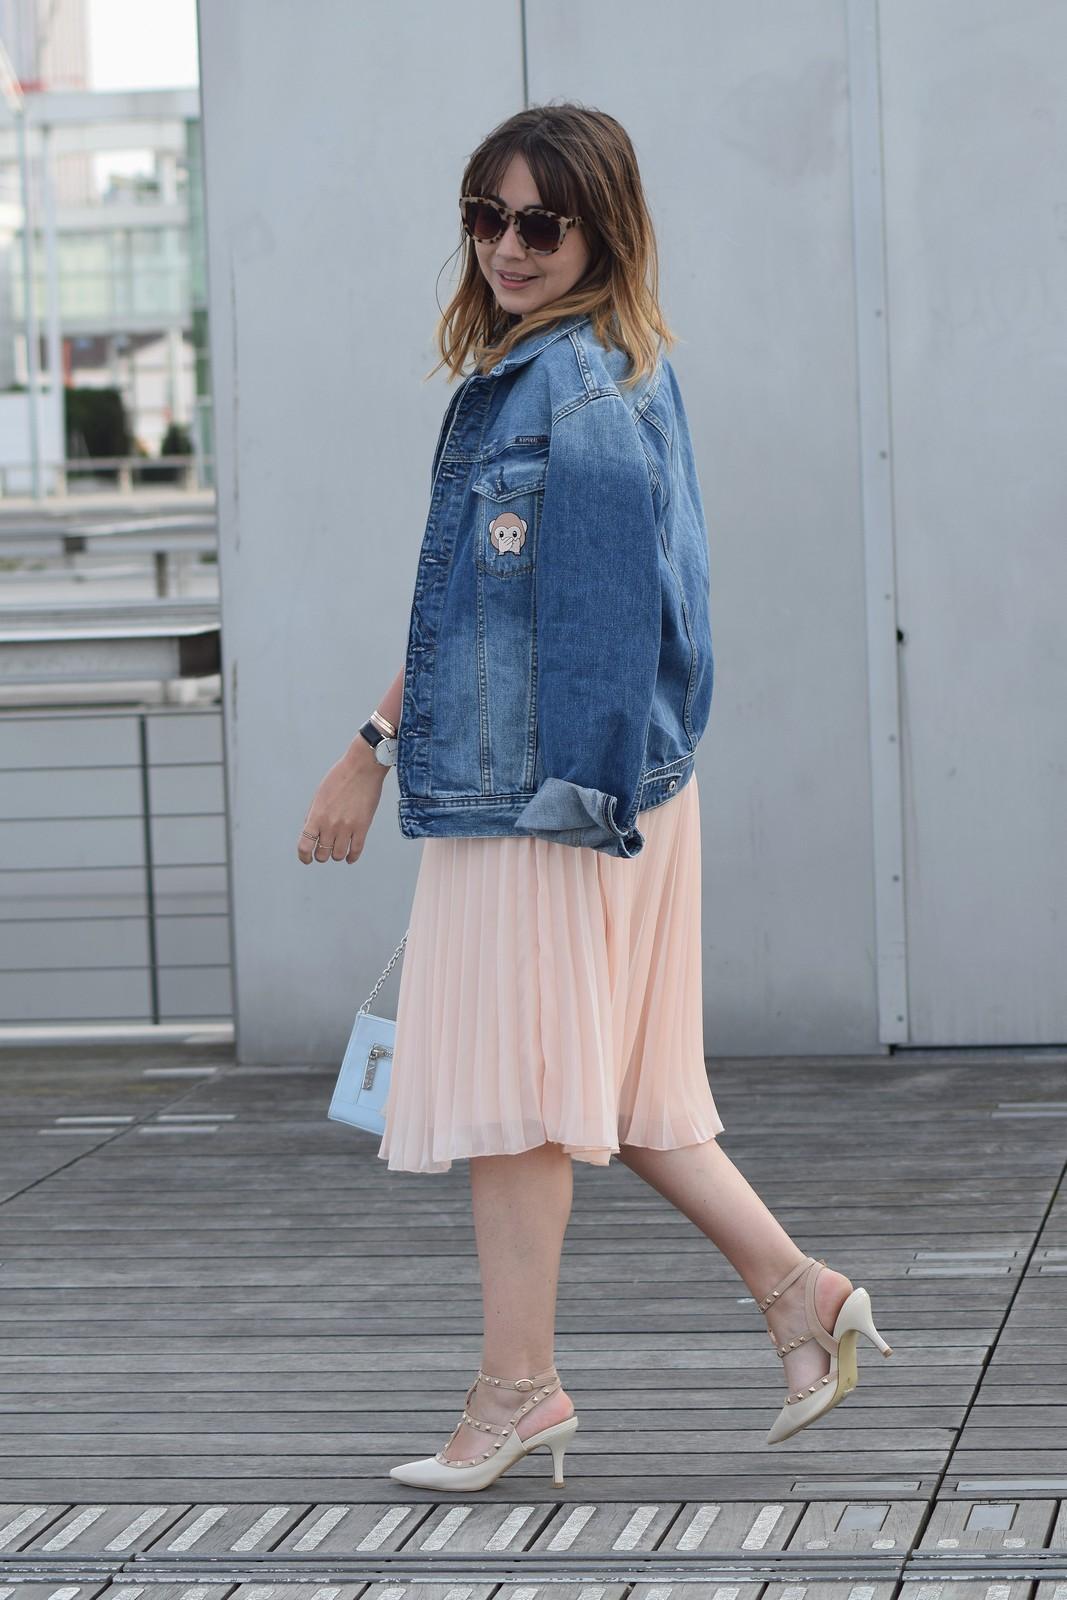 du style madame - streetstyle - mode femme - look femme - paris - jupe midi rose